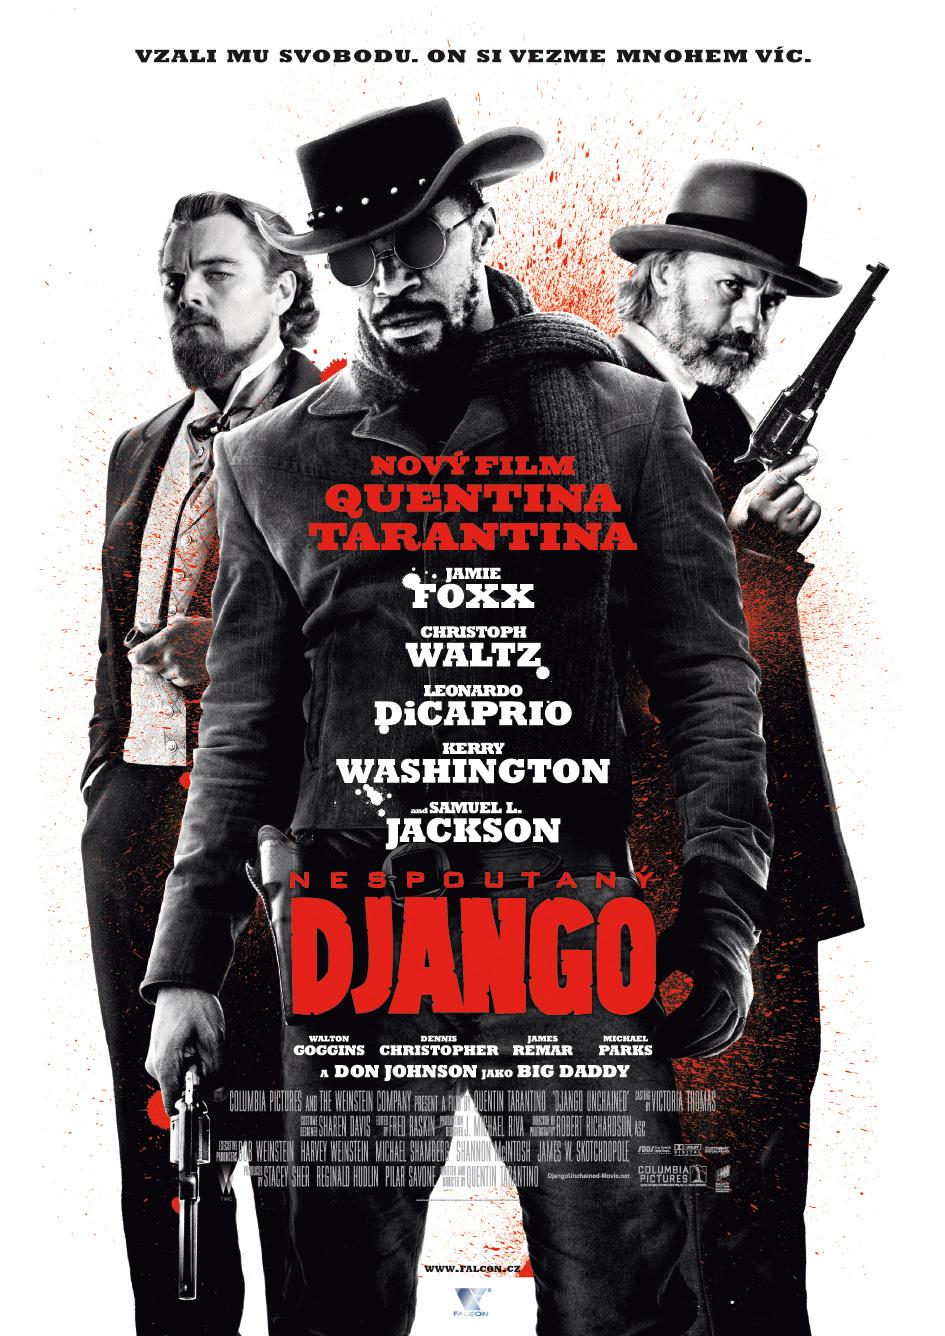 Nespoutaný Django:Tak co k tomu říct Tarantino, Washington,Caprio atd... to je jistota sama o sobě skvělé Drama(5.Místo)